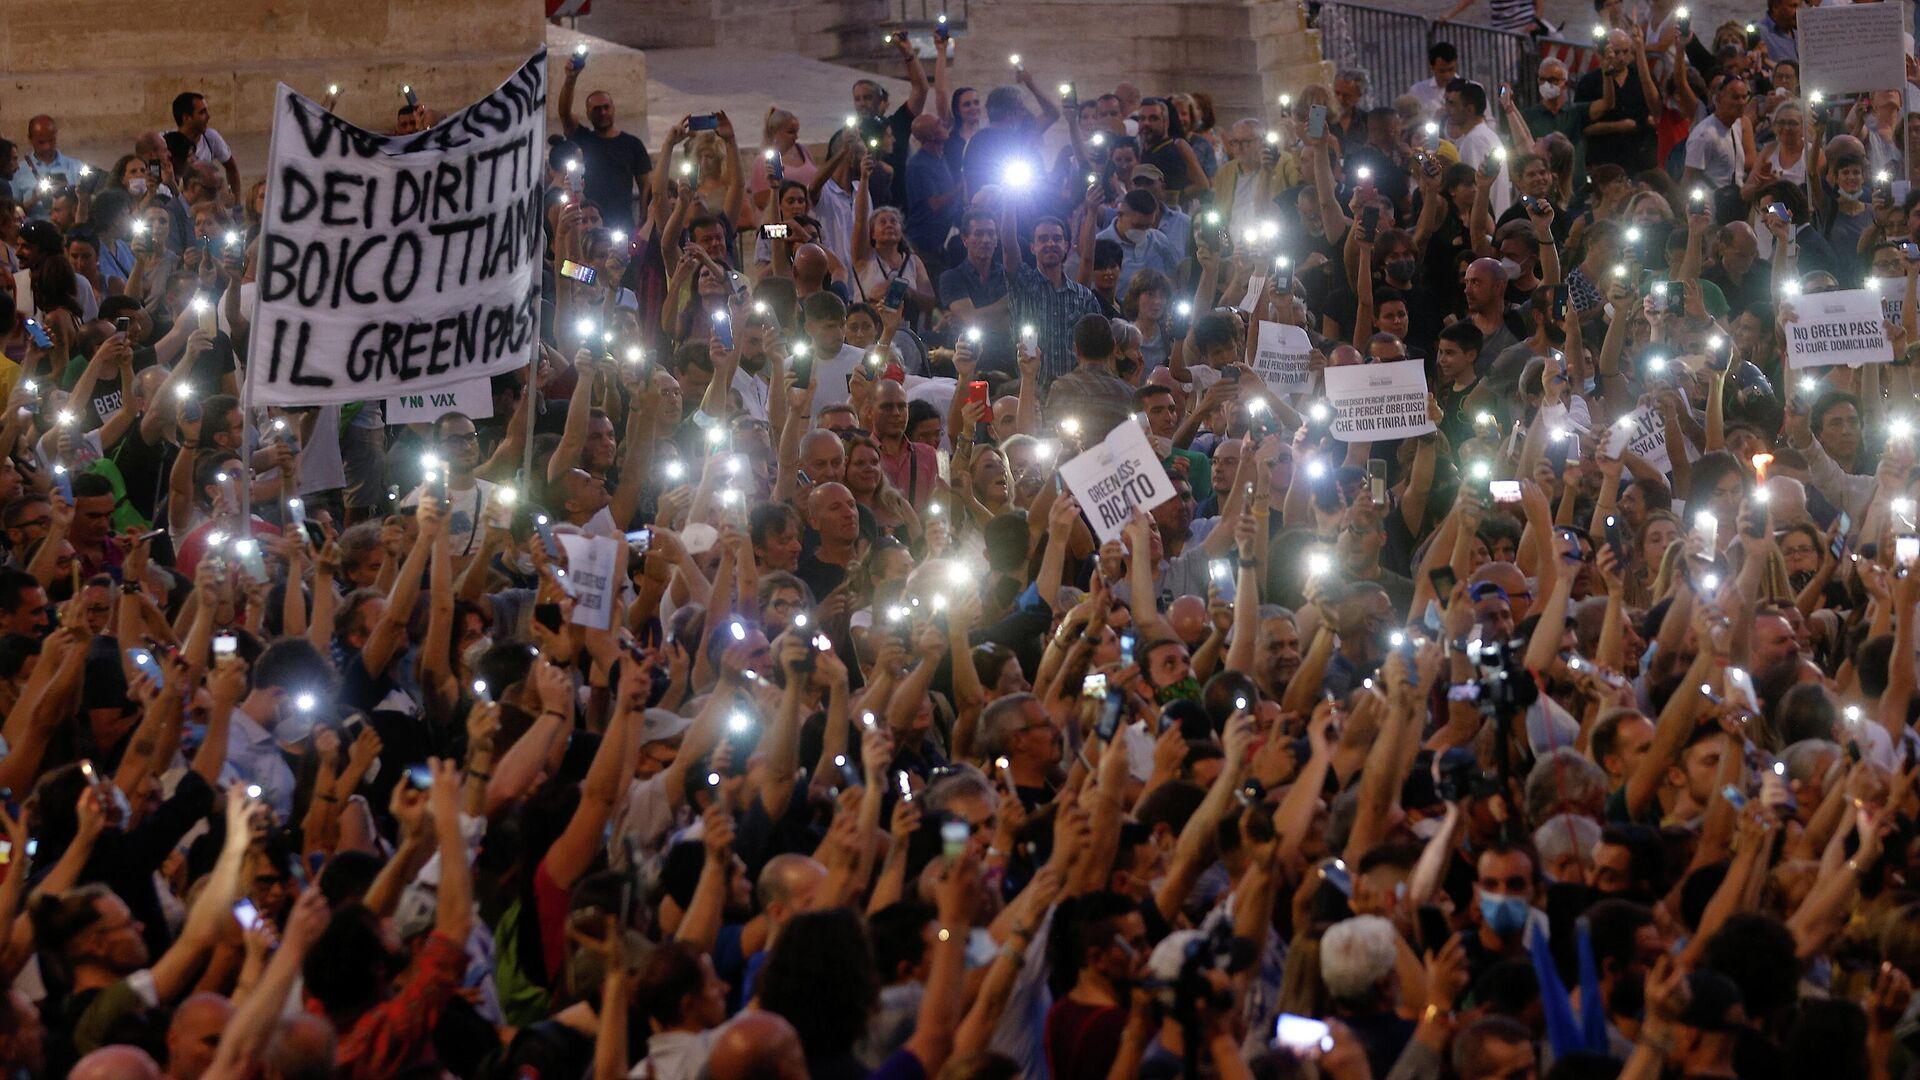 Protestas contra el pase sanitario obligatorio en Italia - Sputnik Mundo, 1920, 29.07.2021